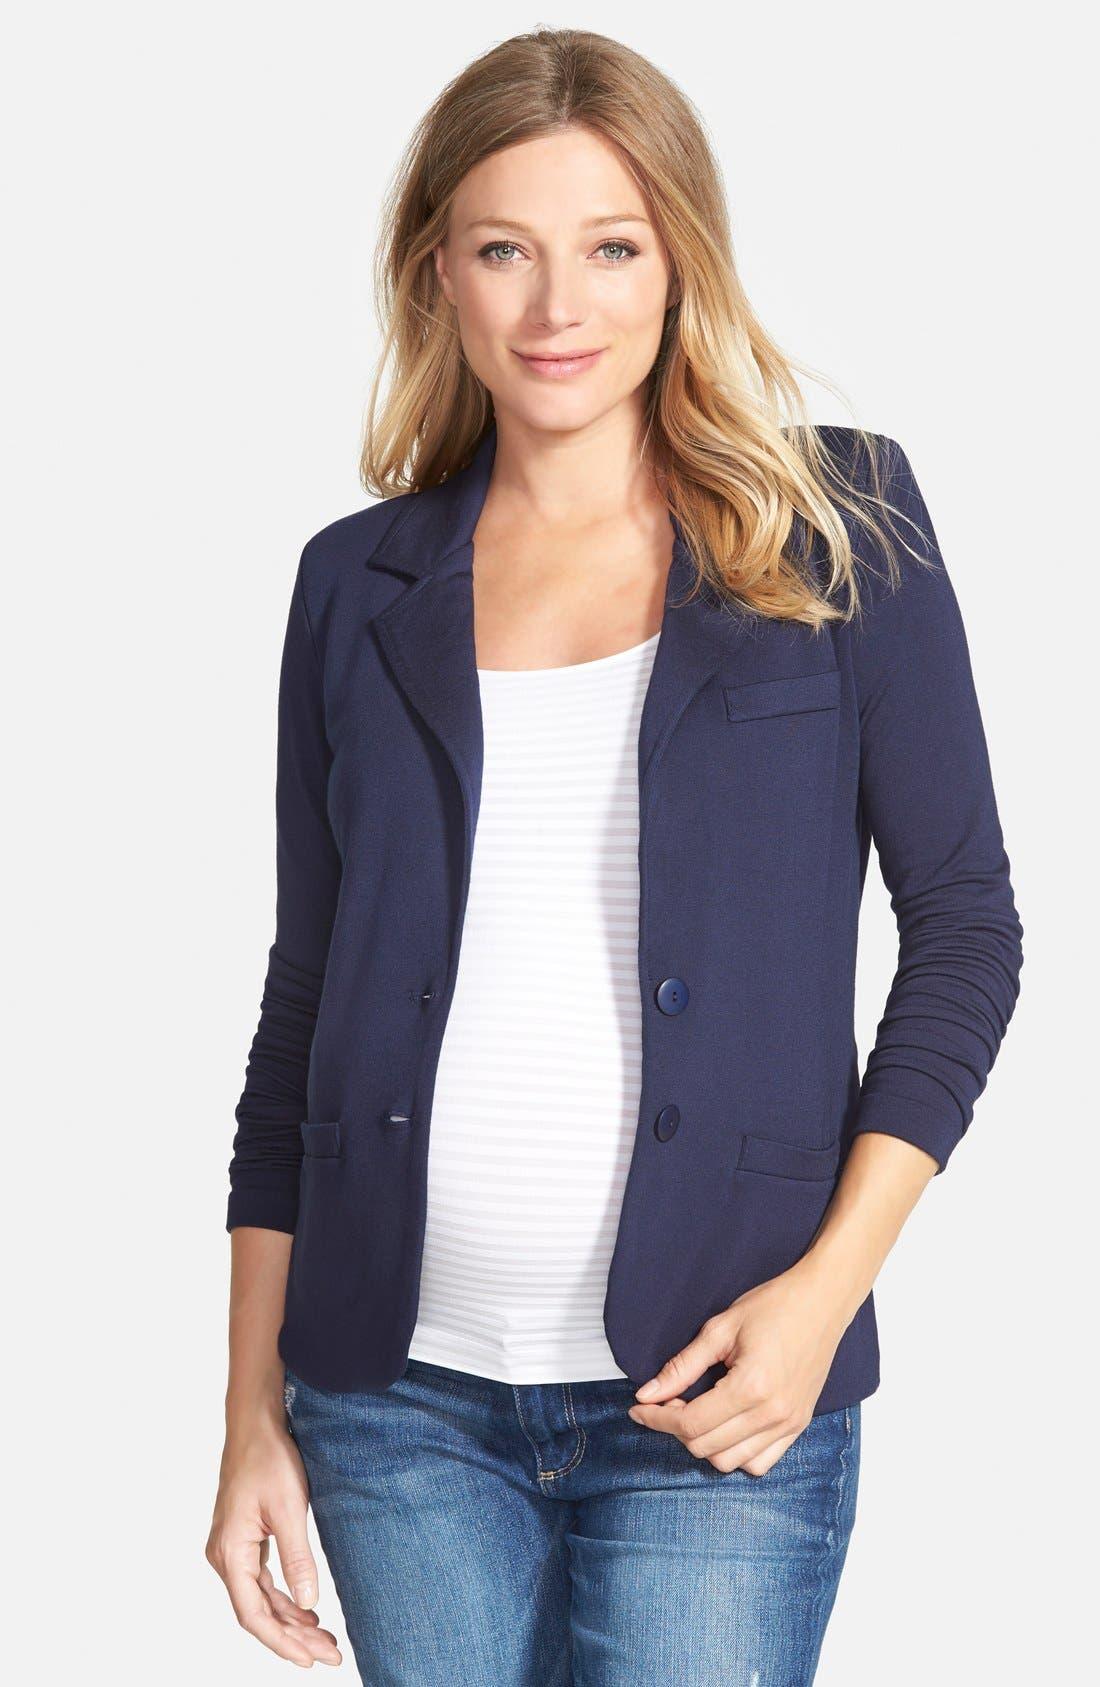 Main Image - Tart Maternity 'Essential' Maternity Blazer